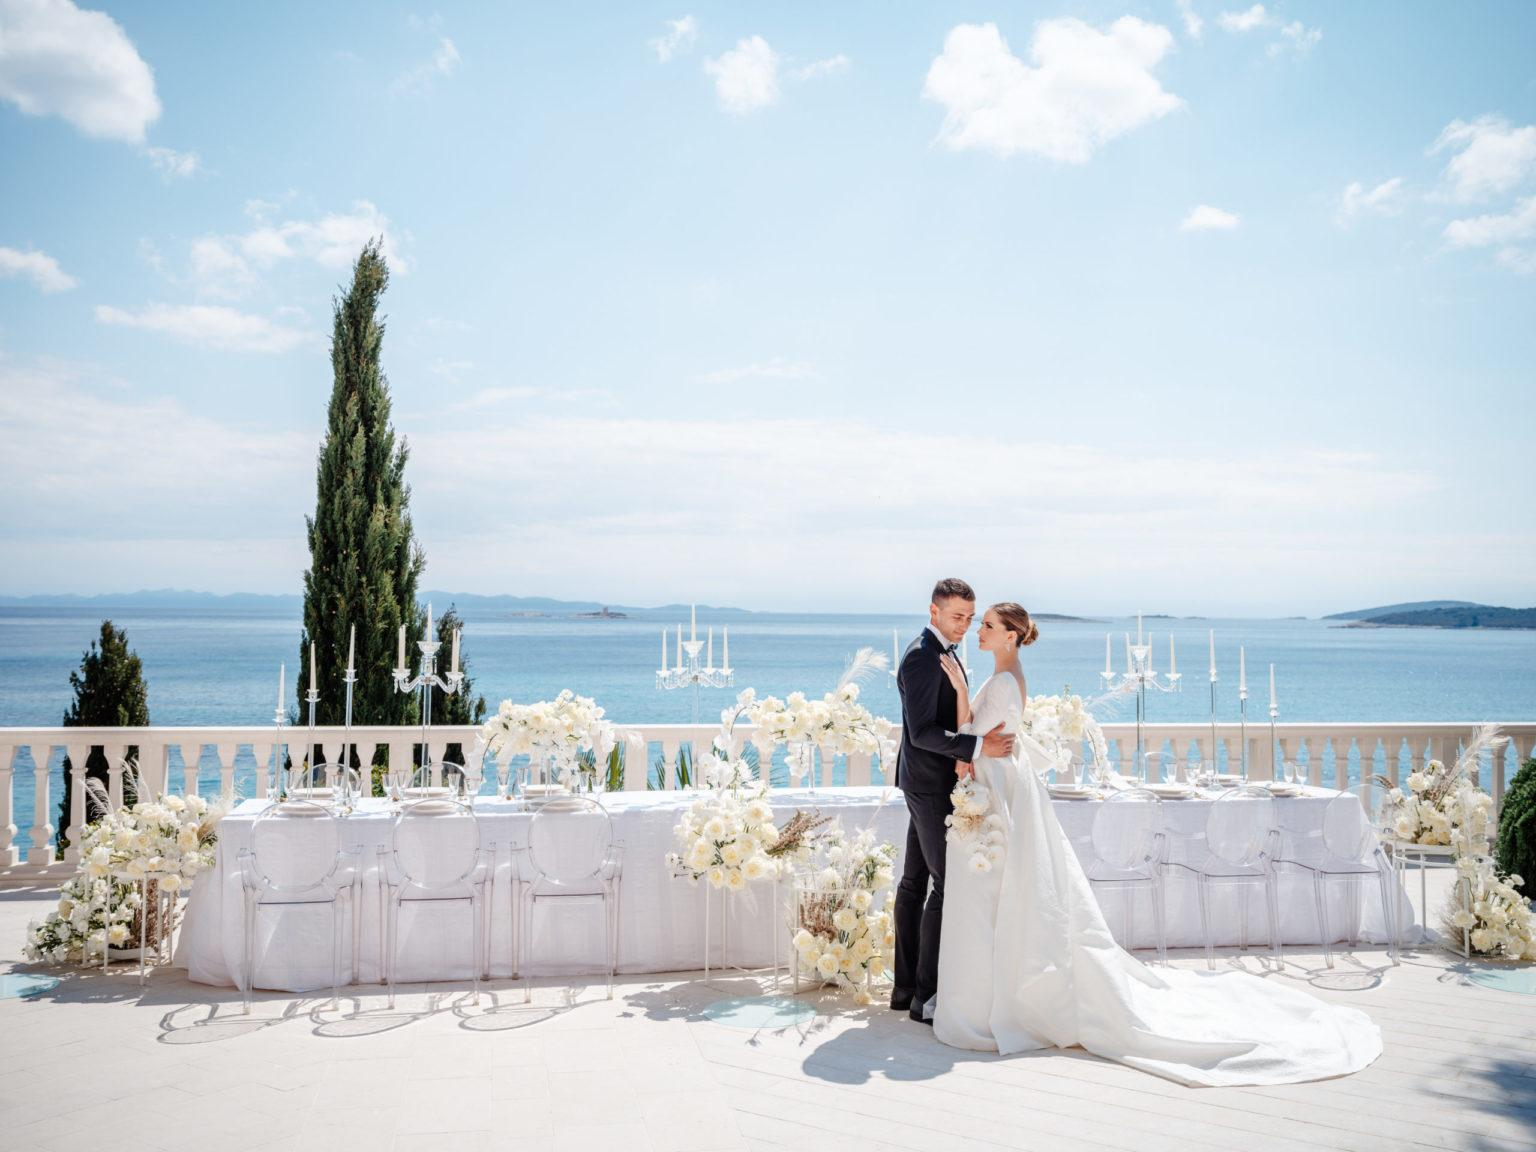 kroatien hochzeit heiraten dalmatien wedding split trauung 13 scaled - Croatia Love - Eure Hochzeit in Kroatien